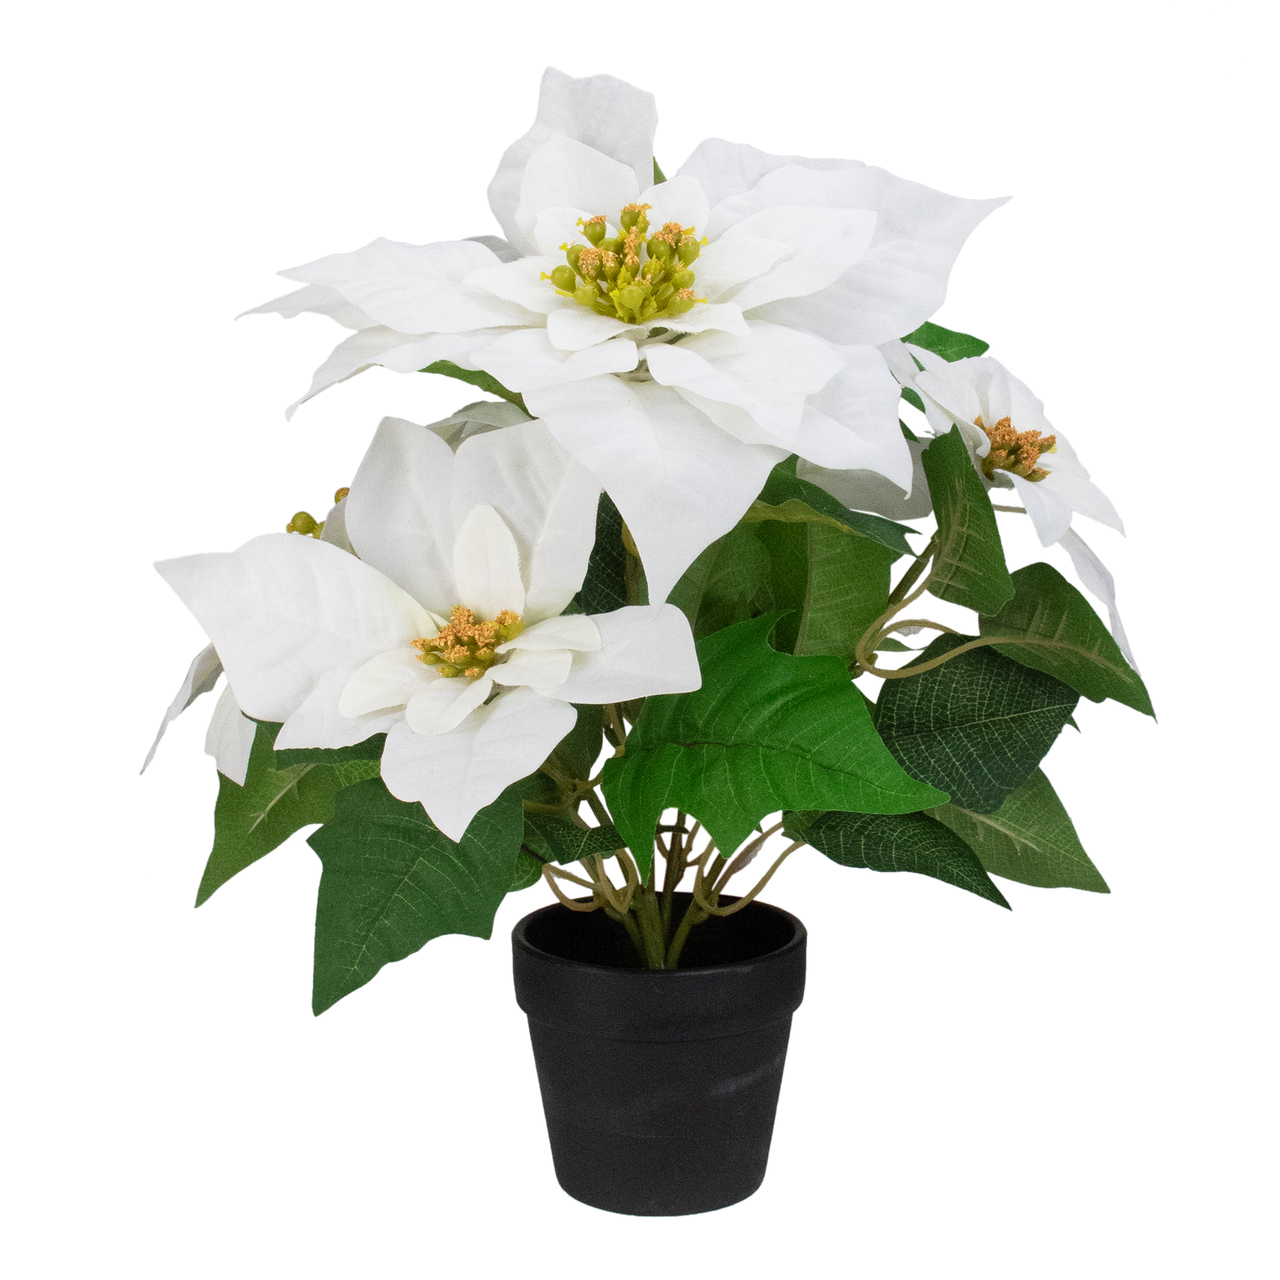 145 Creamy White Artificial Christmas Poinsettia Flower